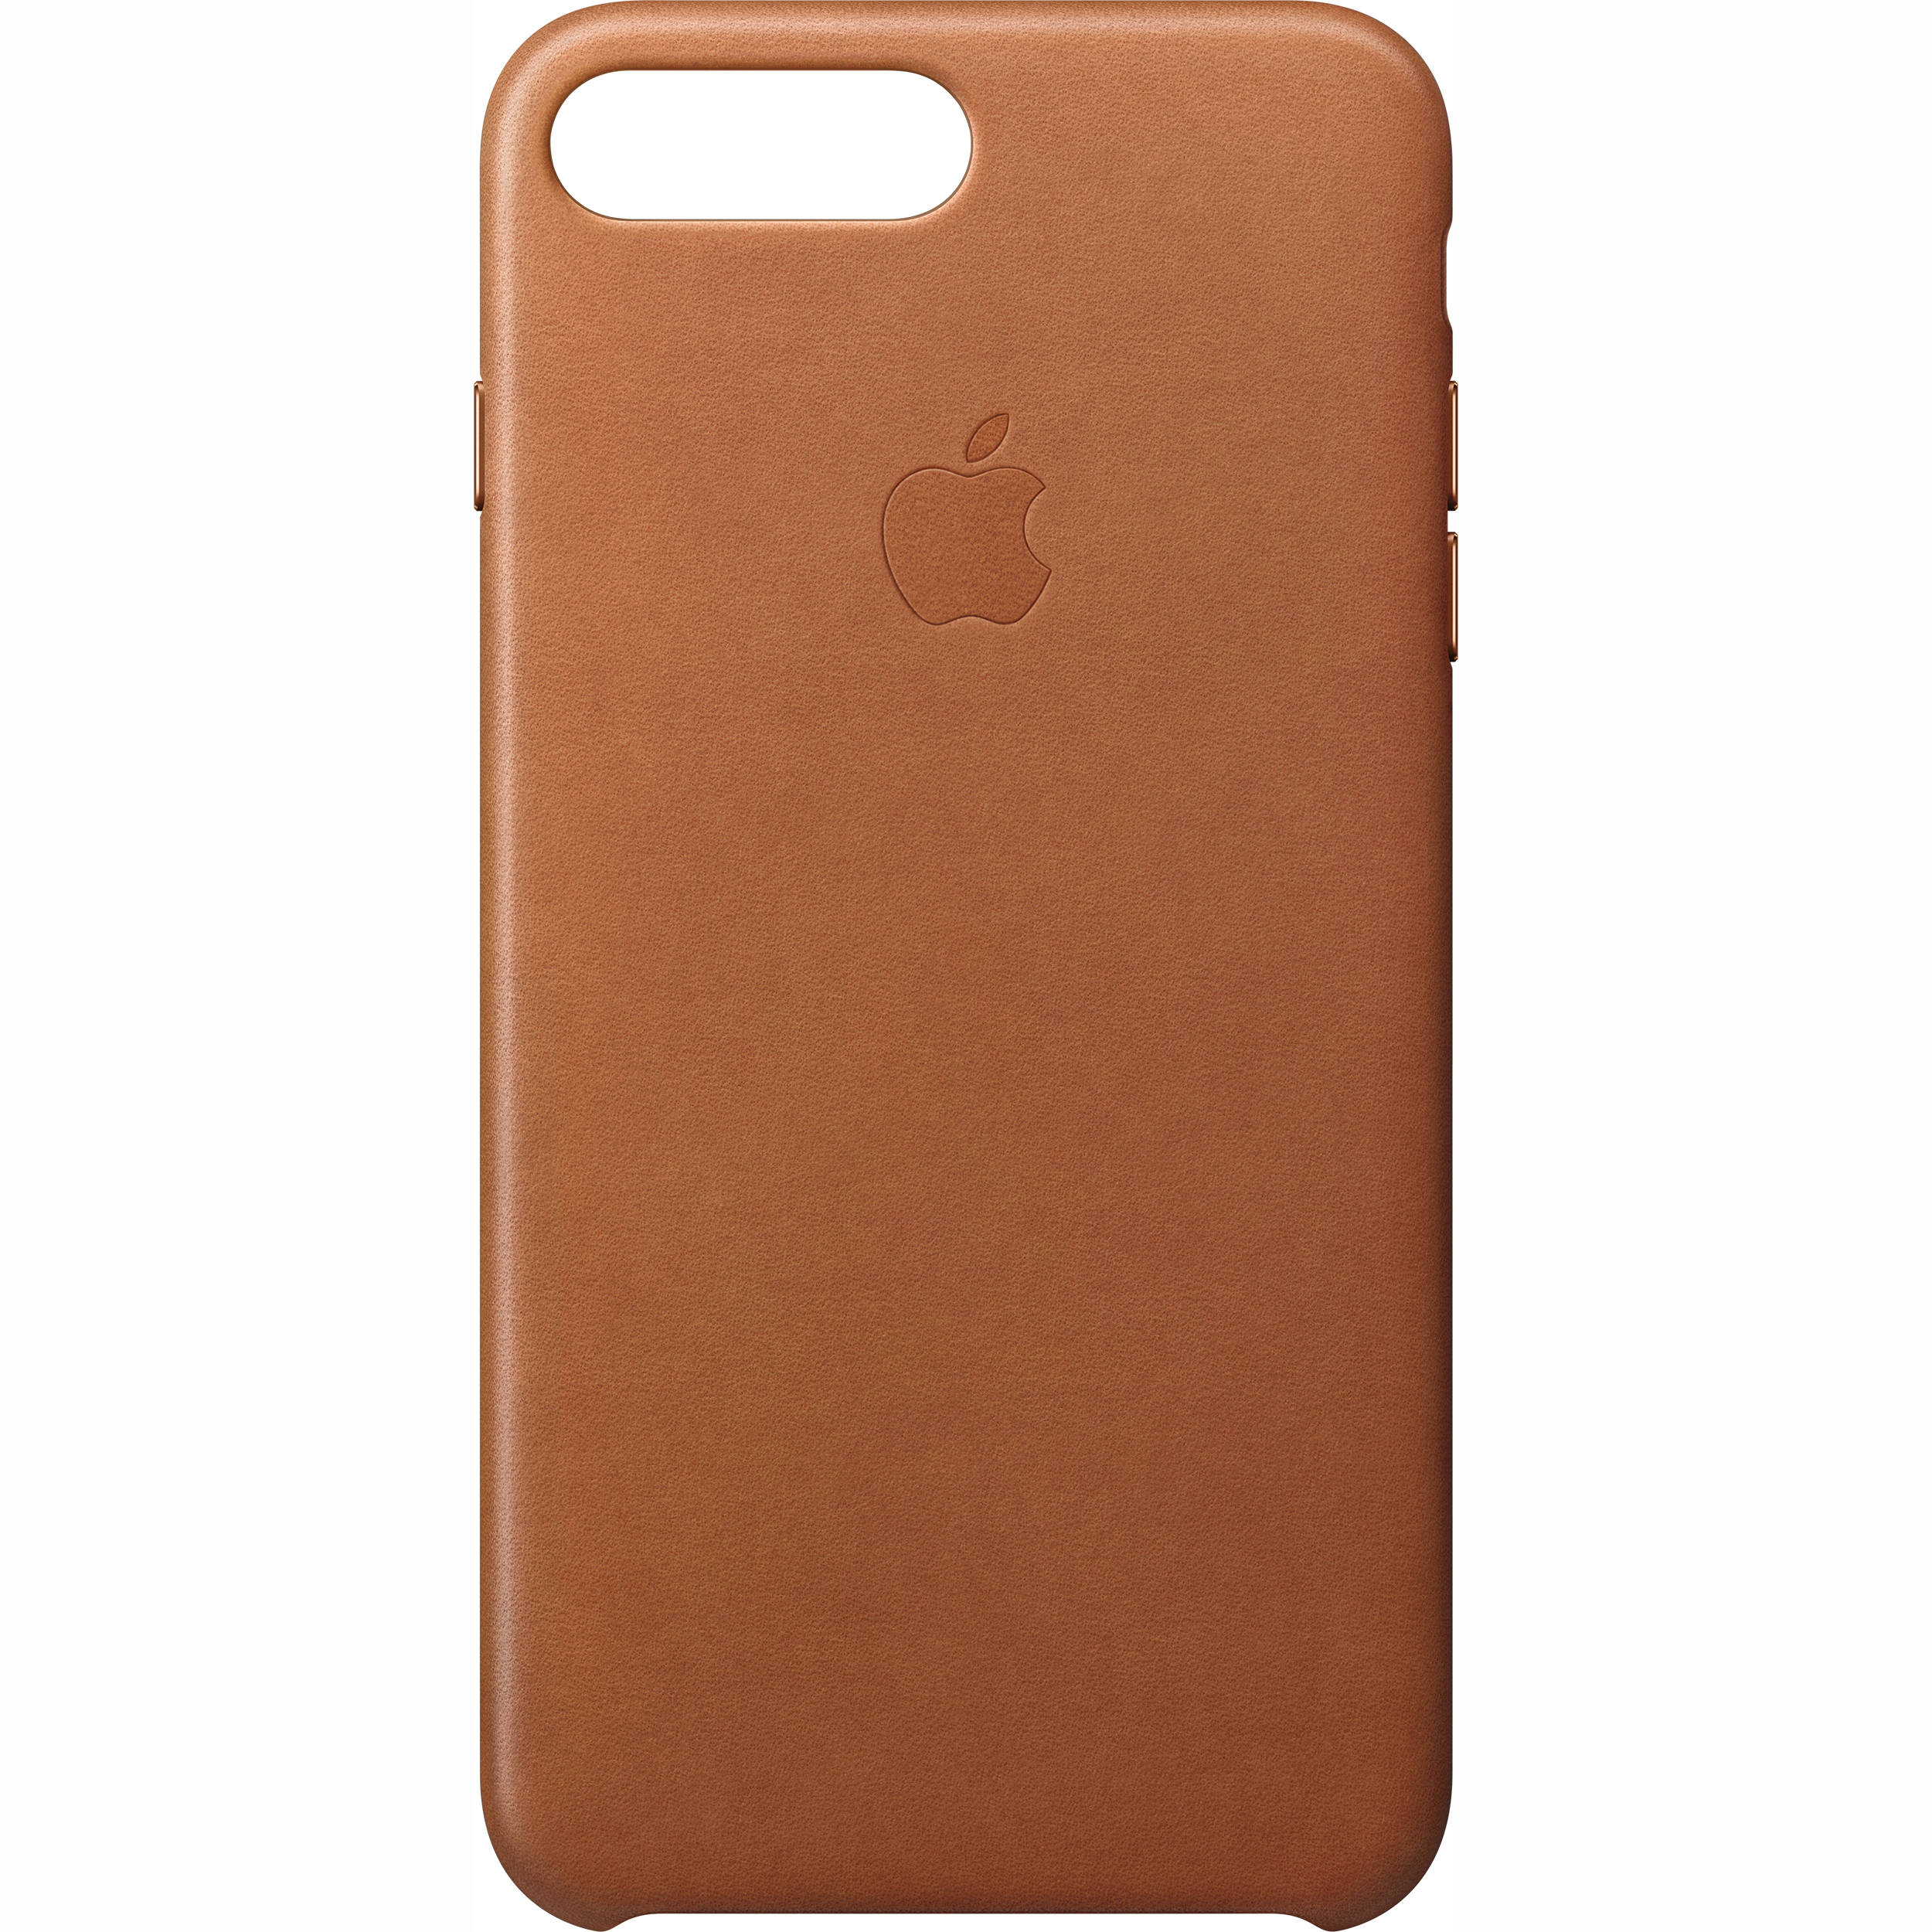 iphone 7 plus case leather tan